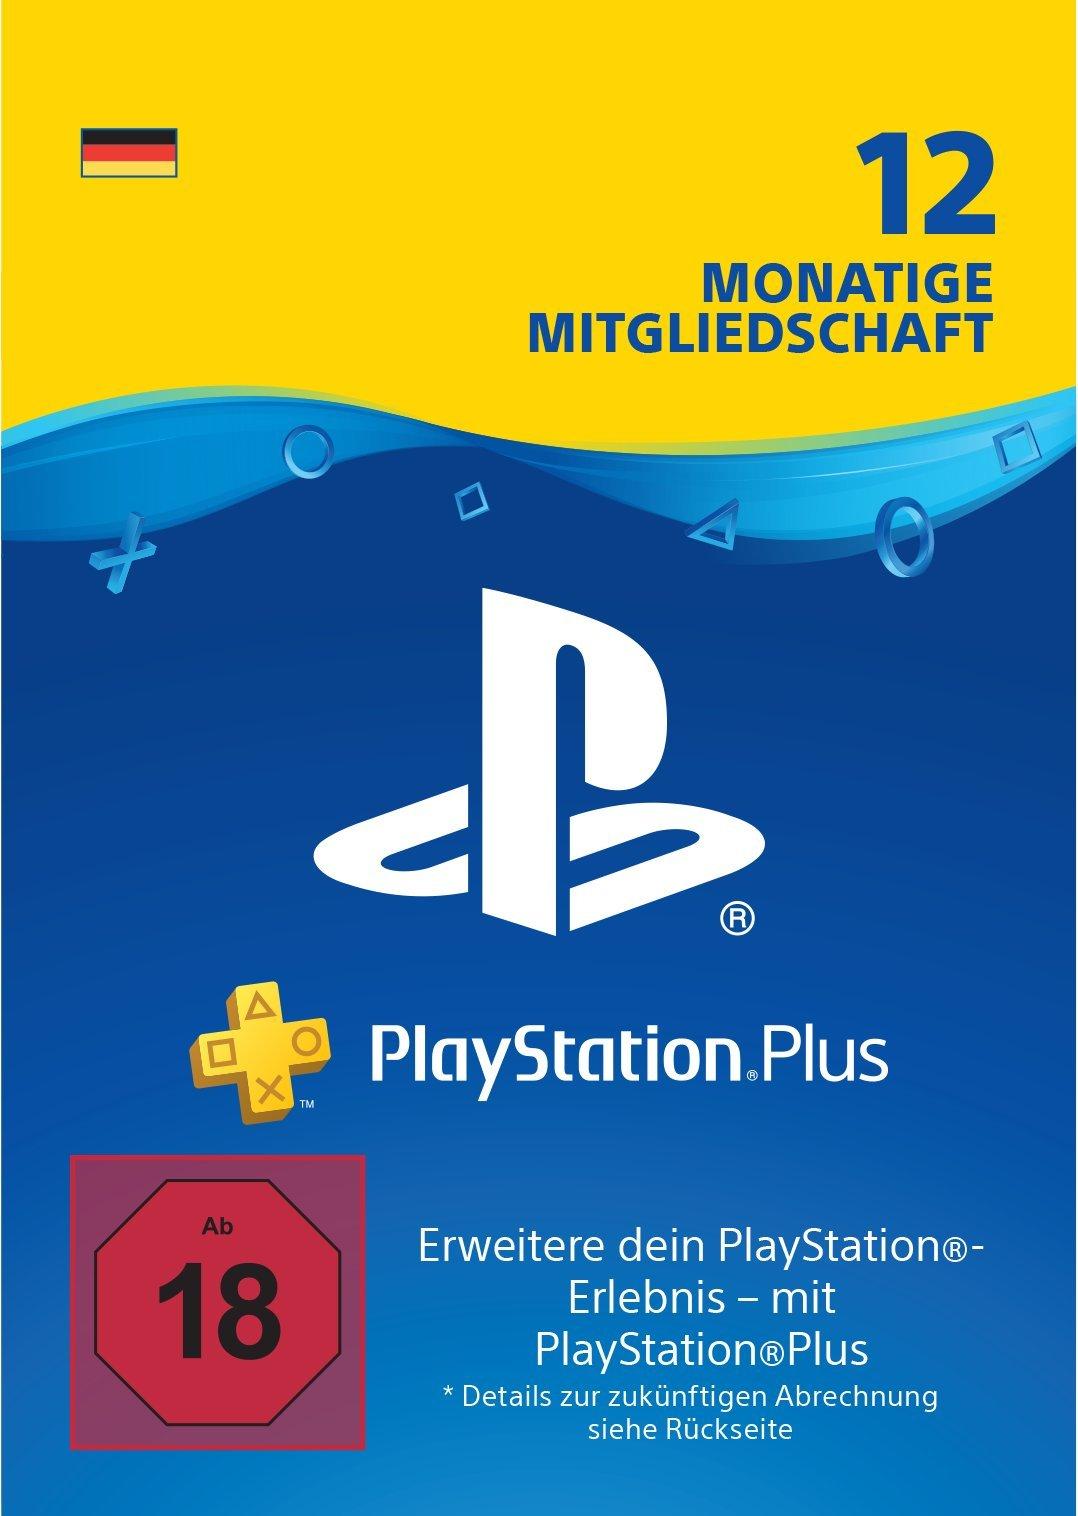 PlayStation Plus Mitgliedschaft | 12 Monate | deutsches Konto | PS4 Download Code product image